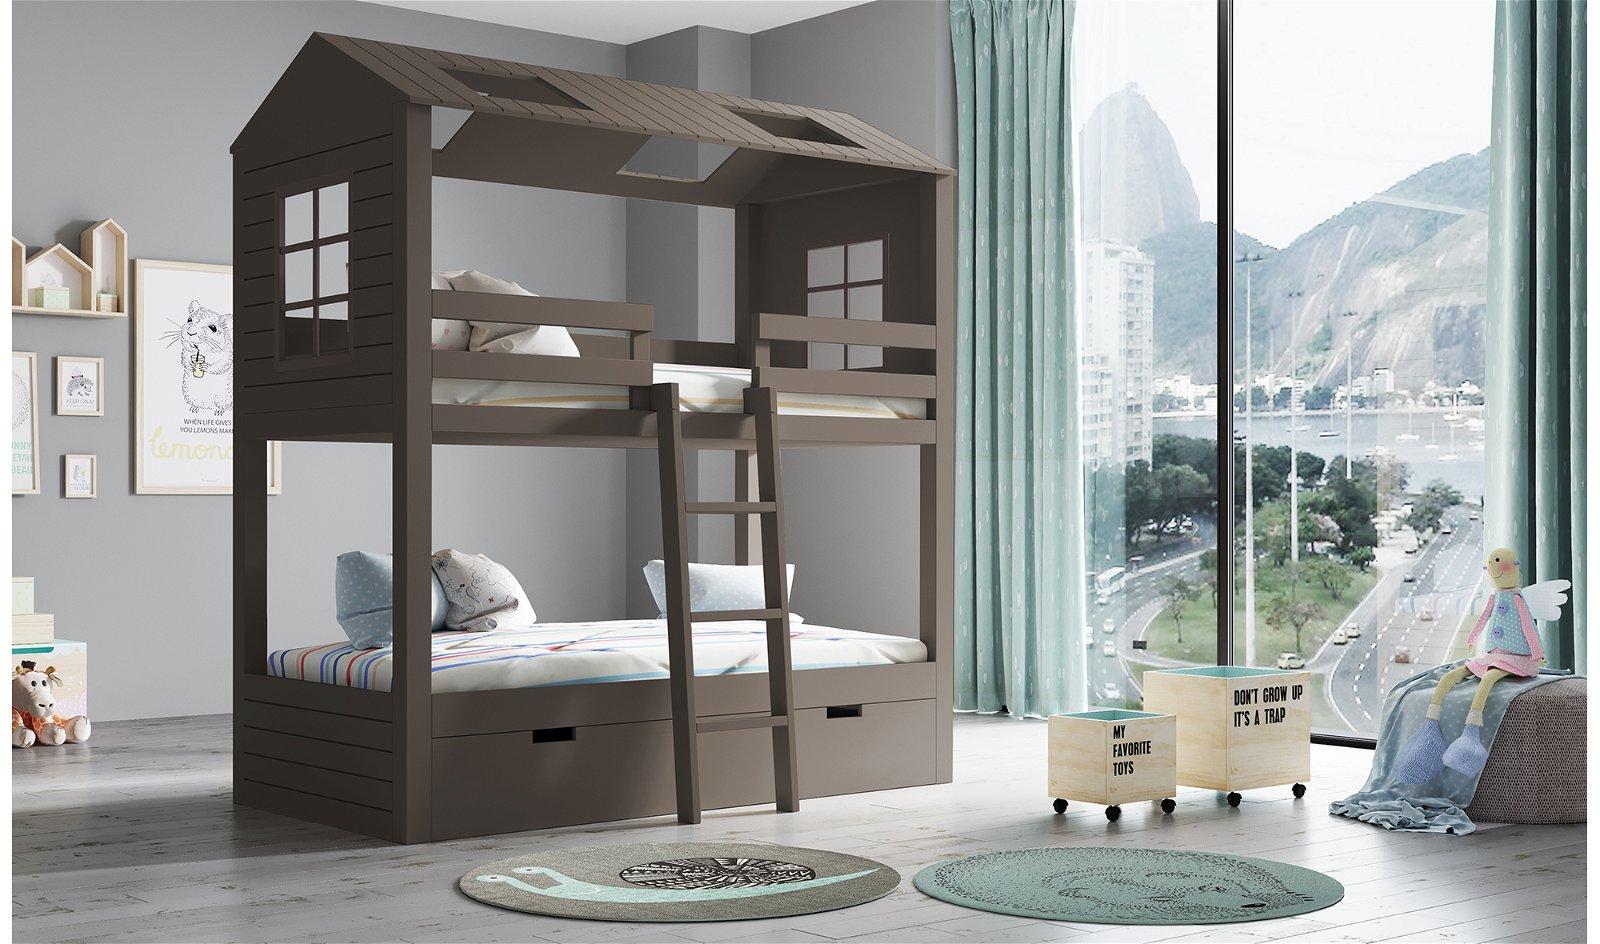 Litera infantil 3 camas 2 aguas Casita